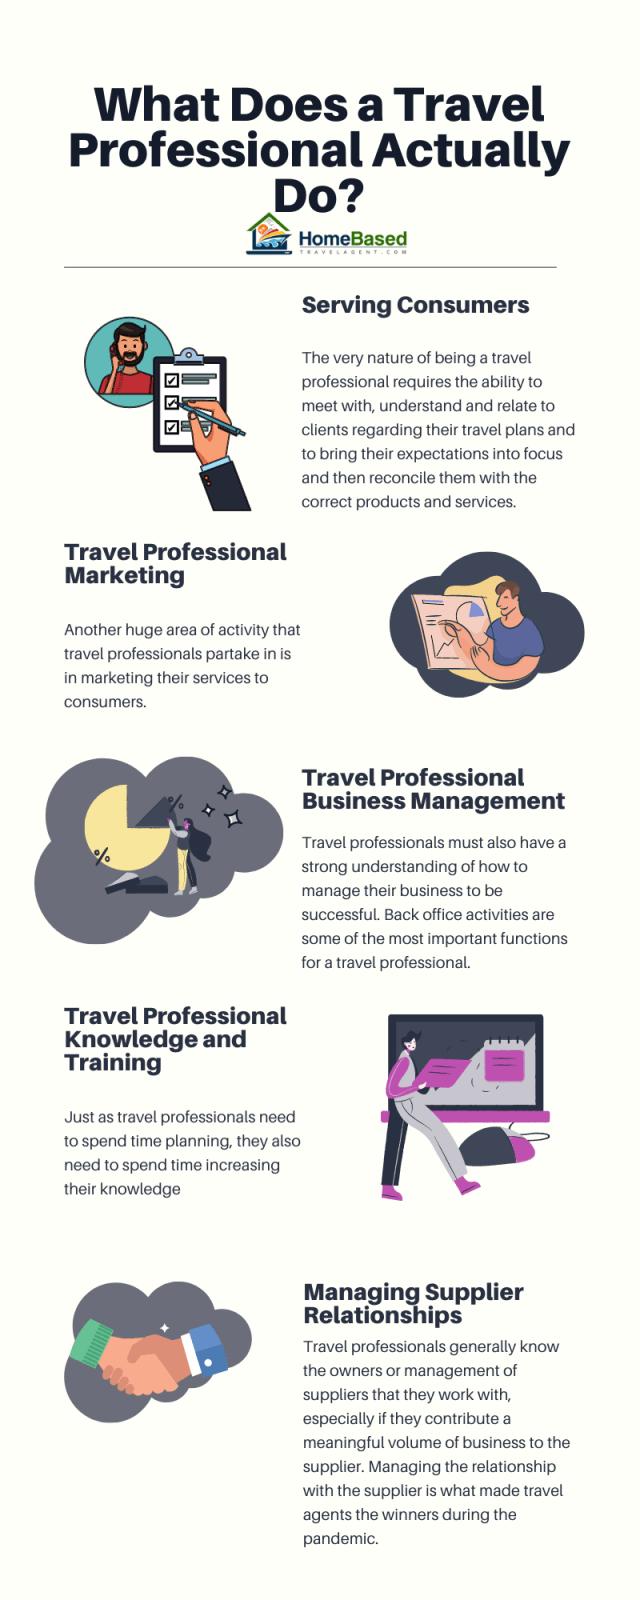 Travel Professional Marketing